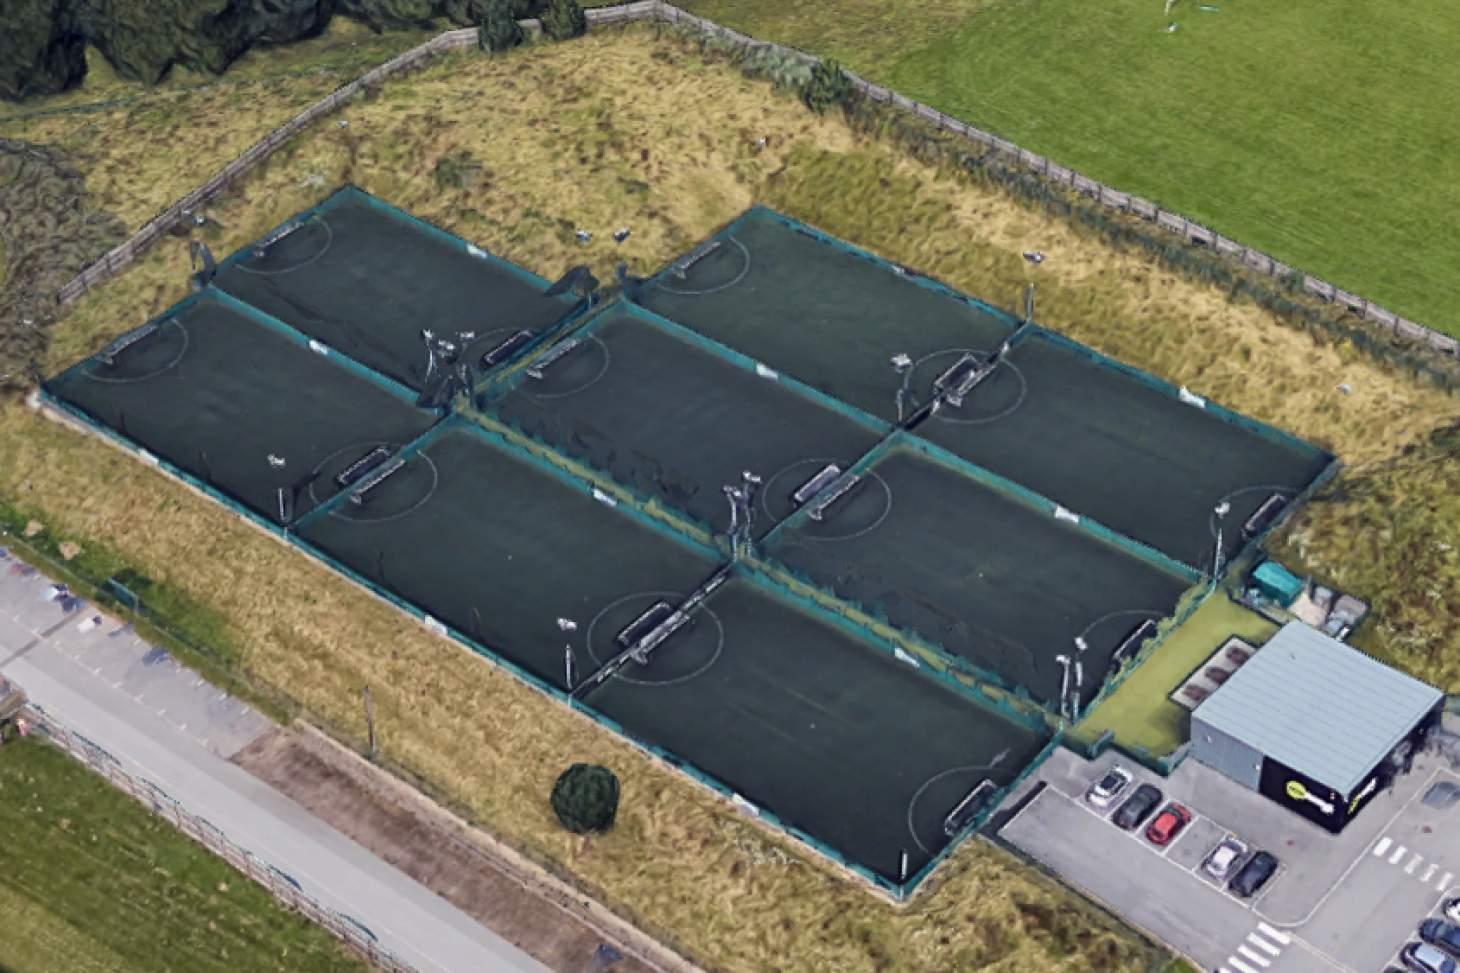 PlayFootball Nottingham 5 a side | 3G Astroturf football pitch